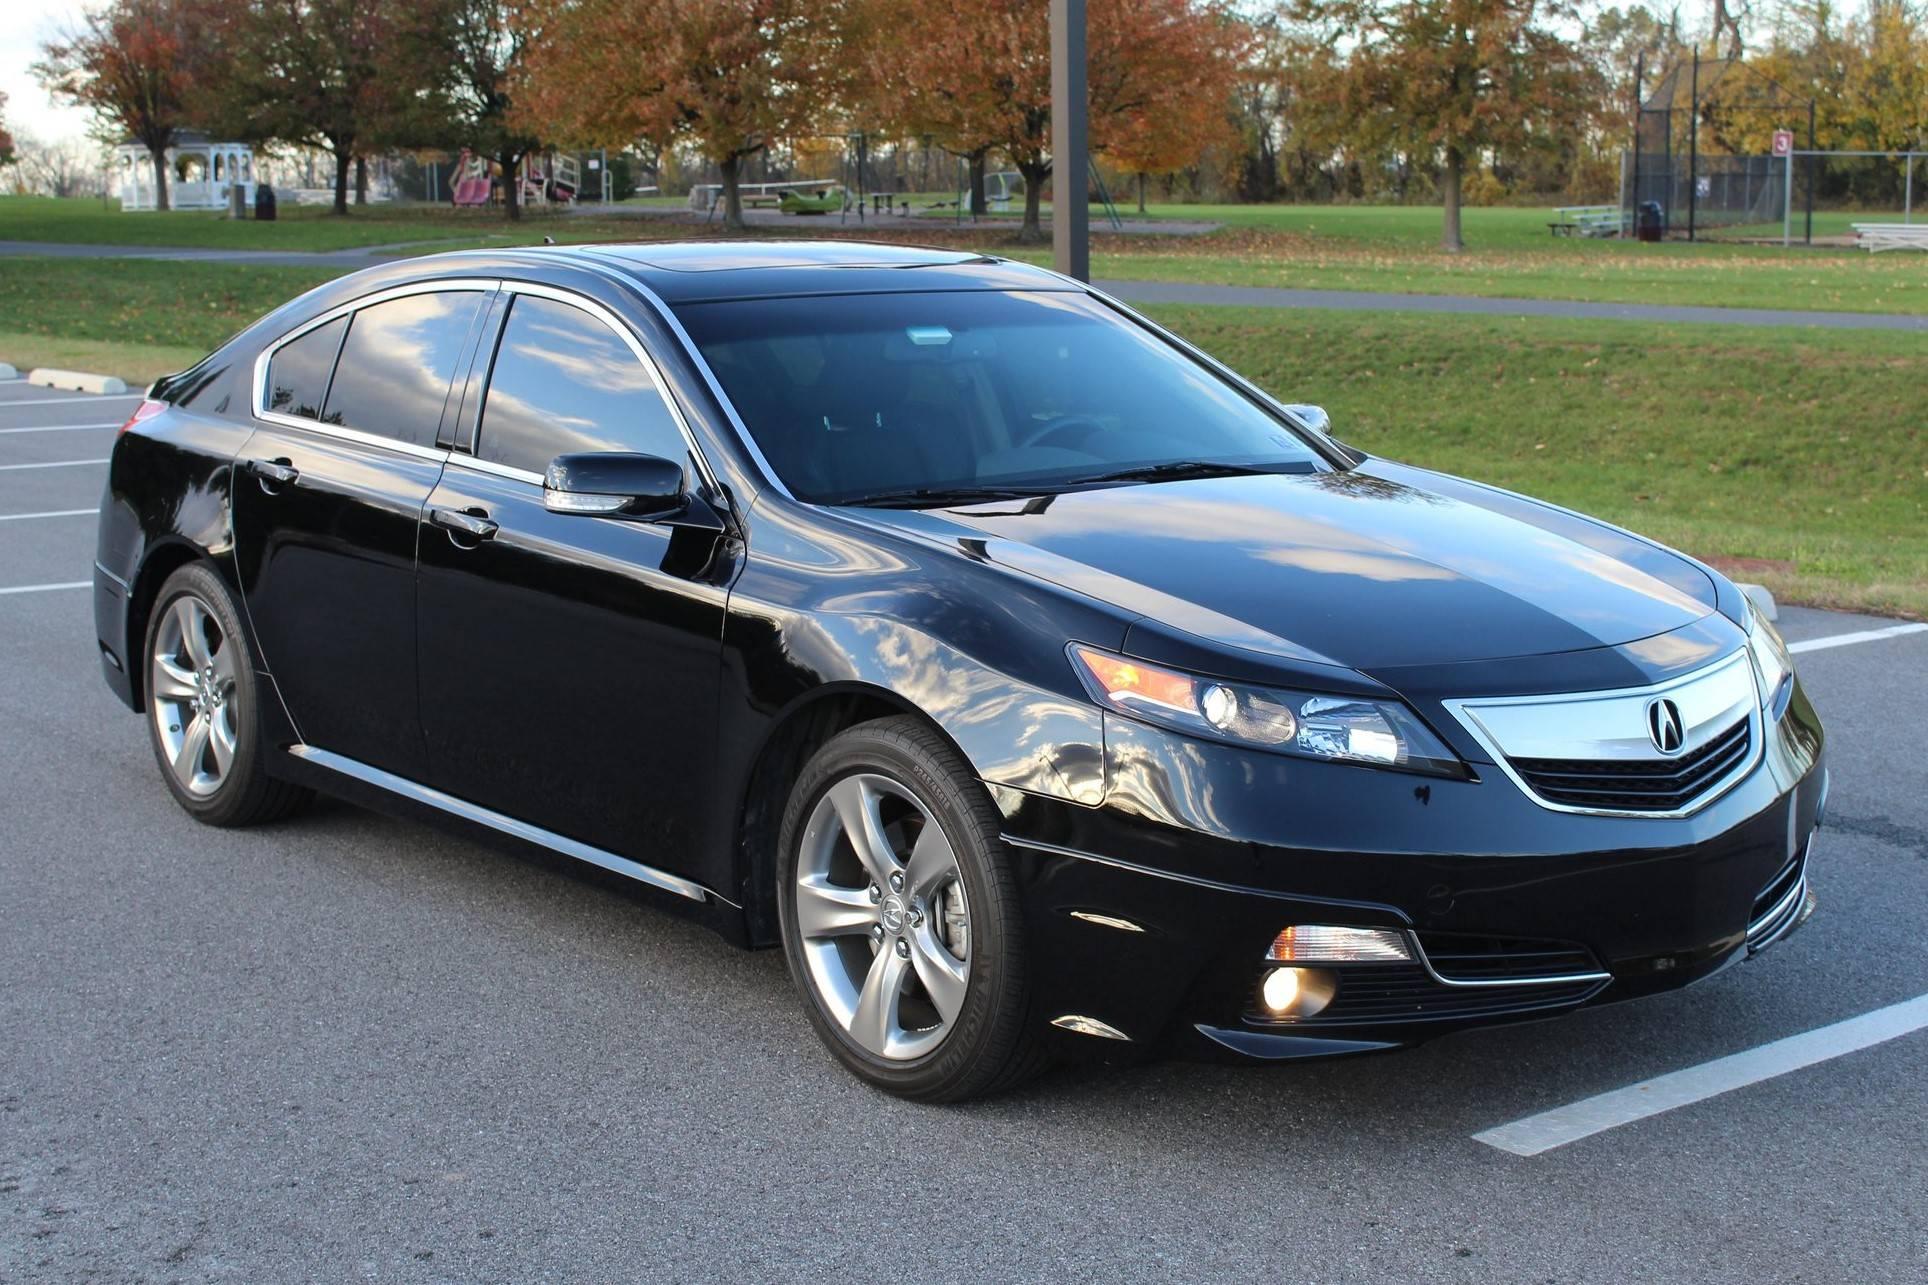 2012 Acura Tl Sh Awd Auction Cars Bids